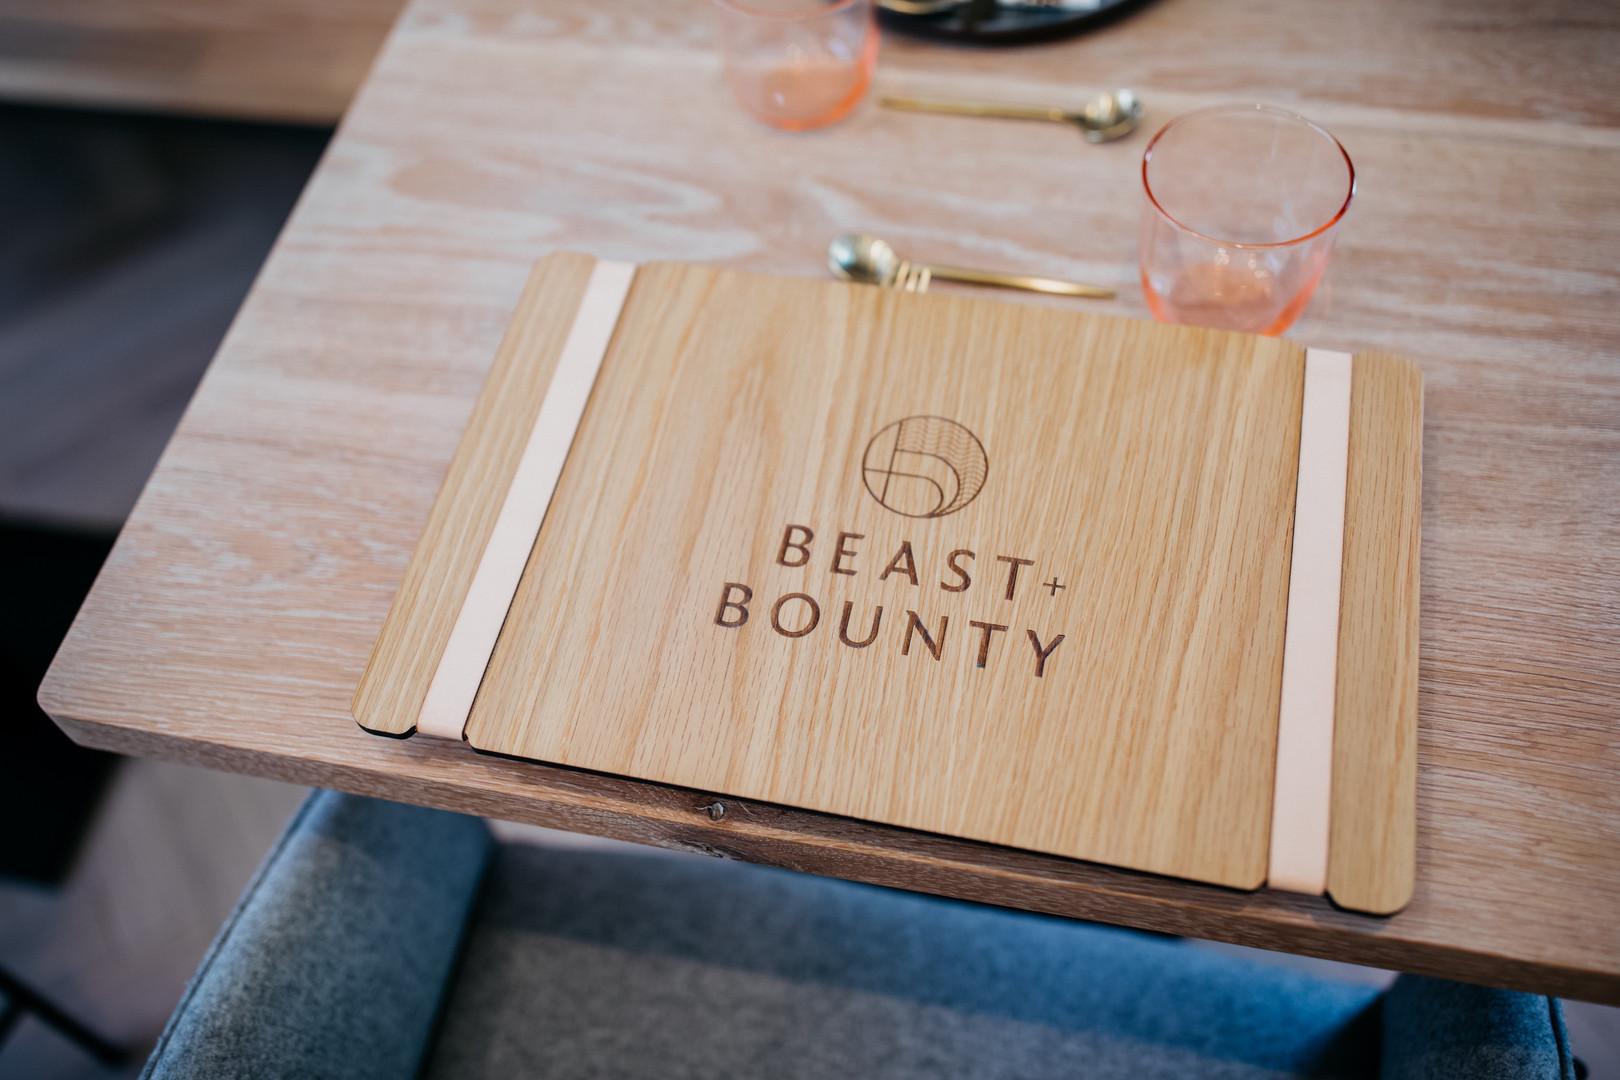 Beast & Bounty X Jake Castro 06/17